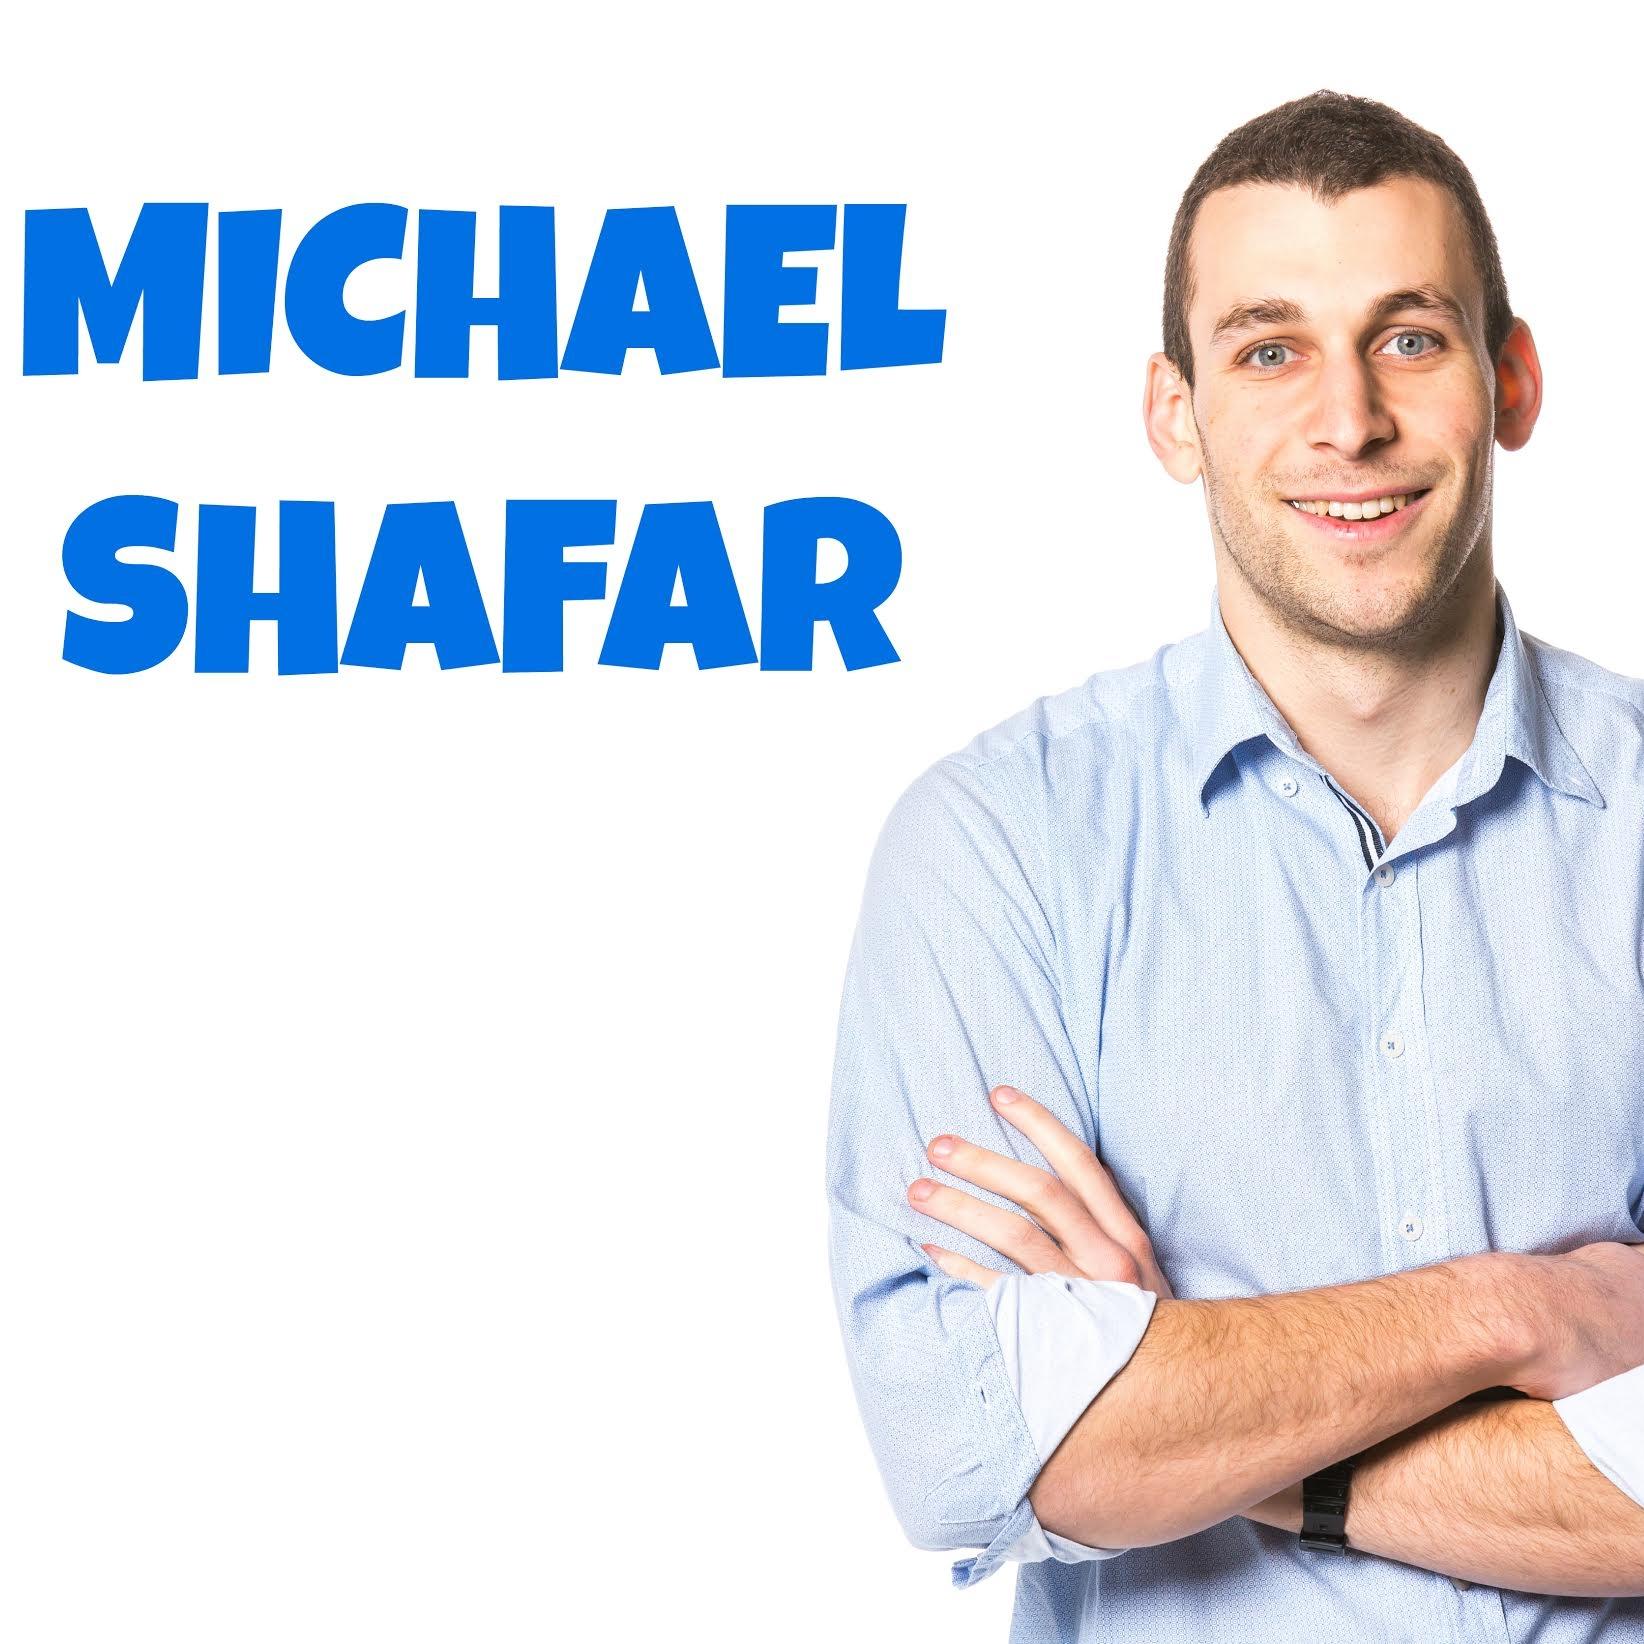 MICHAEL SCHAFAR (Comedy)